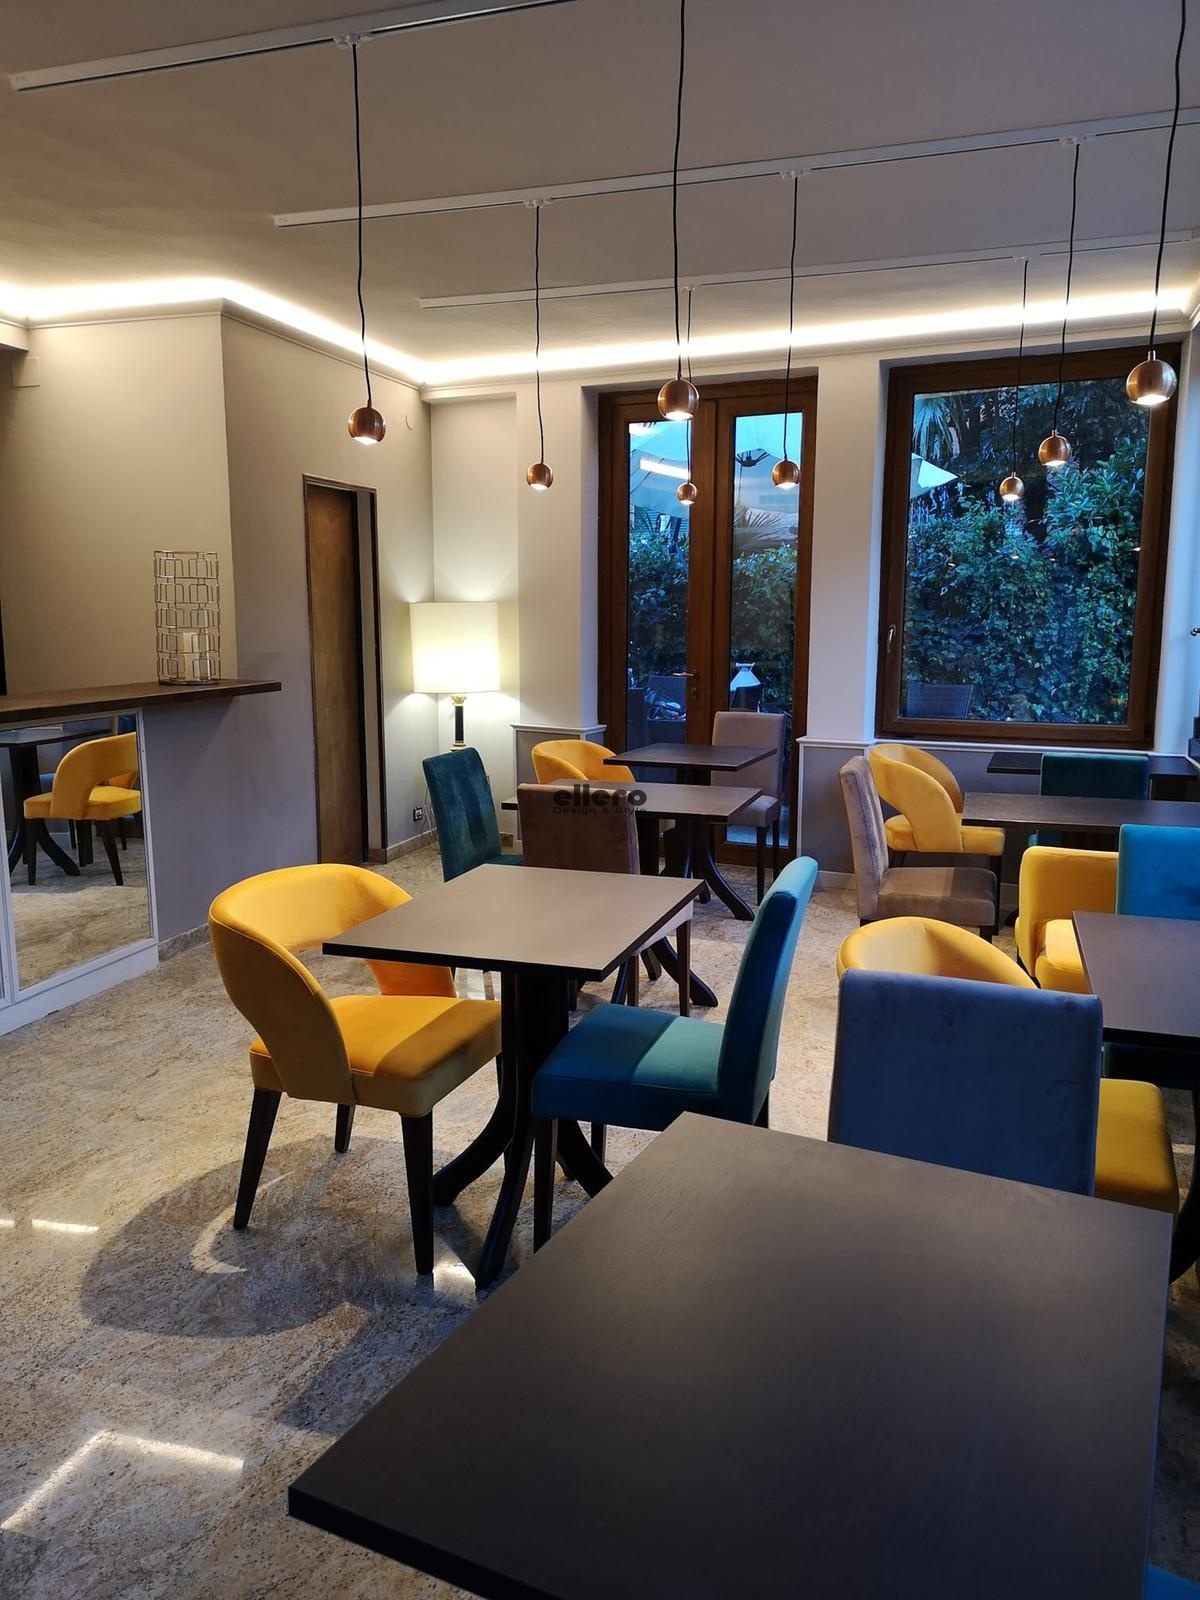 Bessy_armchair_Lory_chair_Hotel_Villa_Stella_Lido_di_Venezia